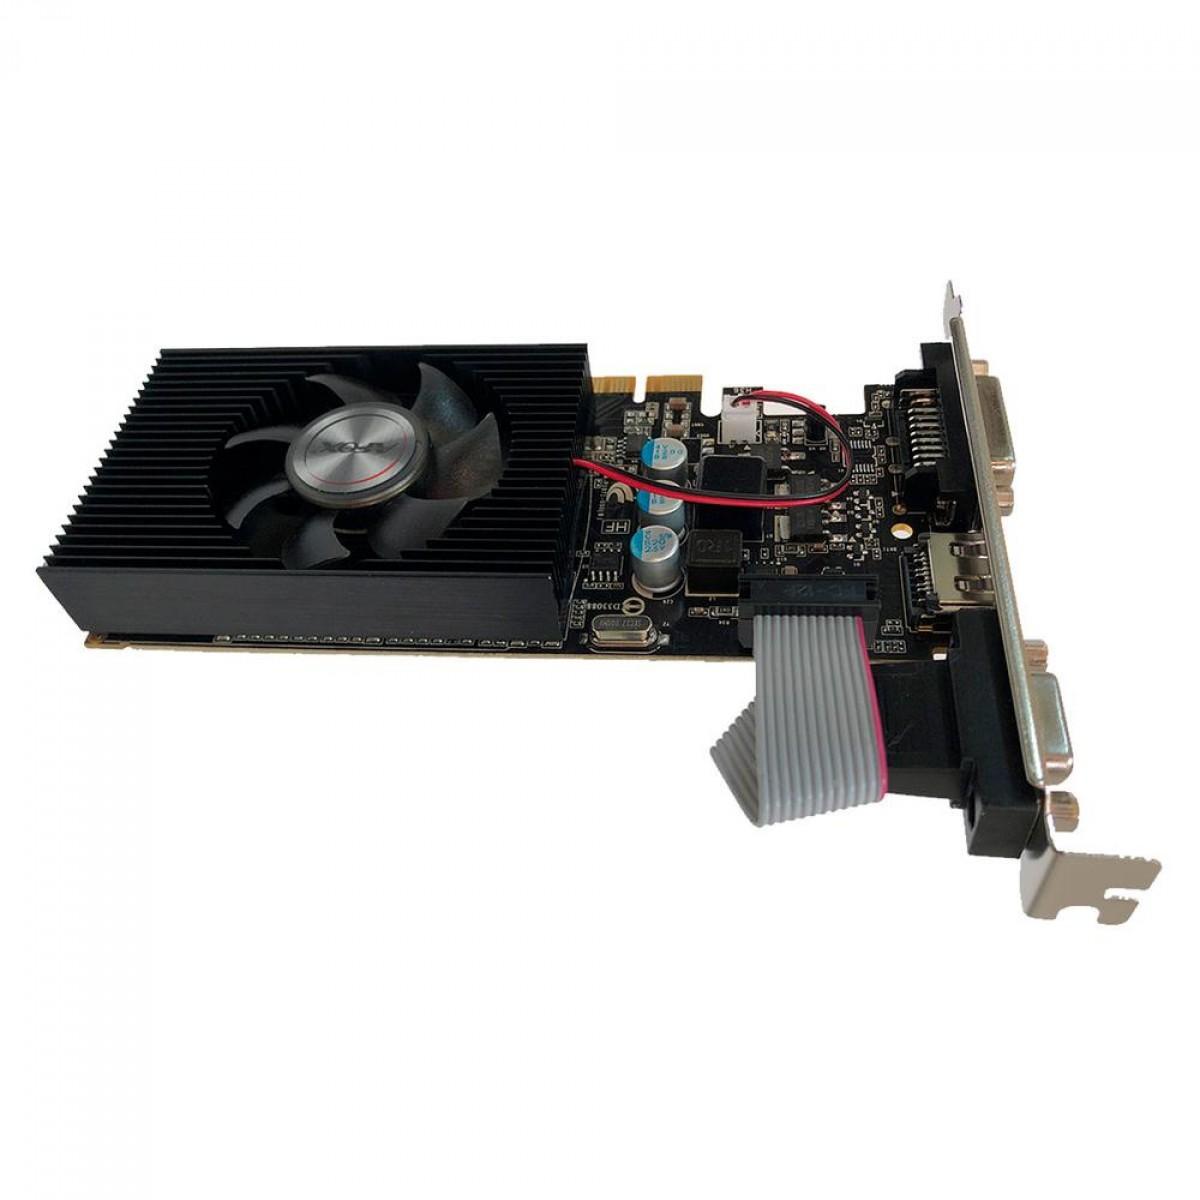 Placa de Vídeo AFox GeForce GT 420, 2GB, GDDR3, 128bit, AF420-2048D3L5